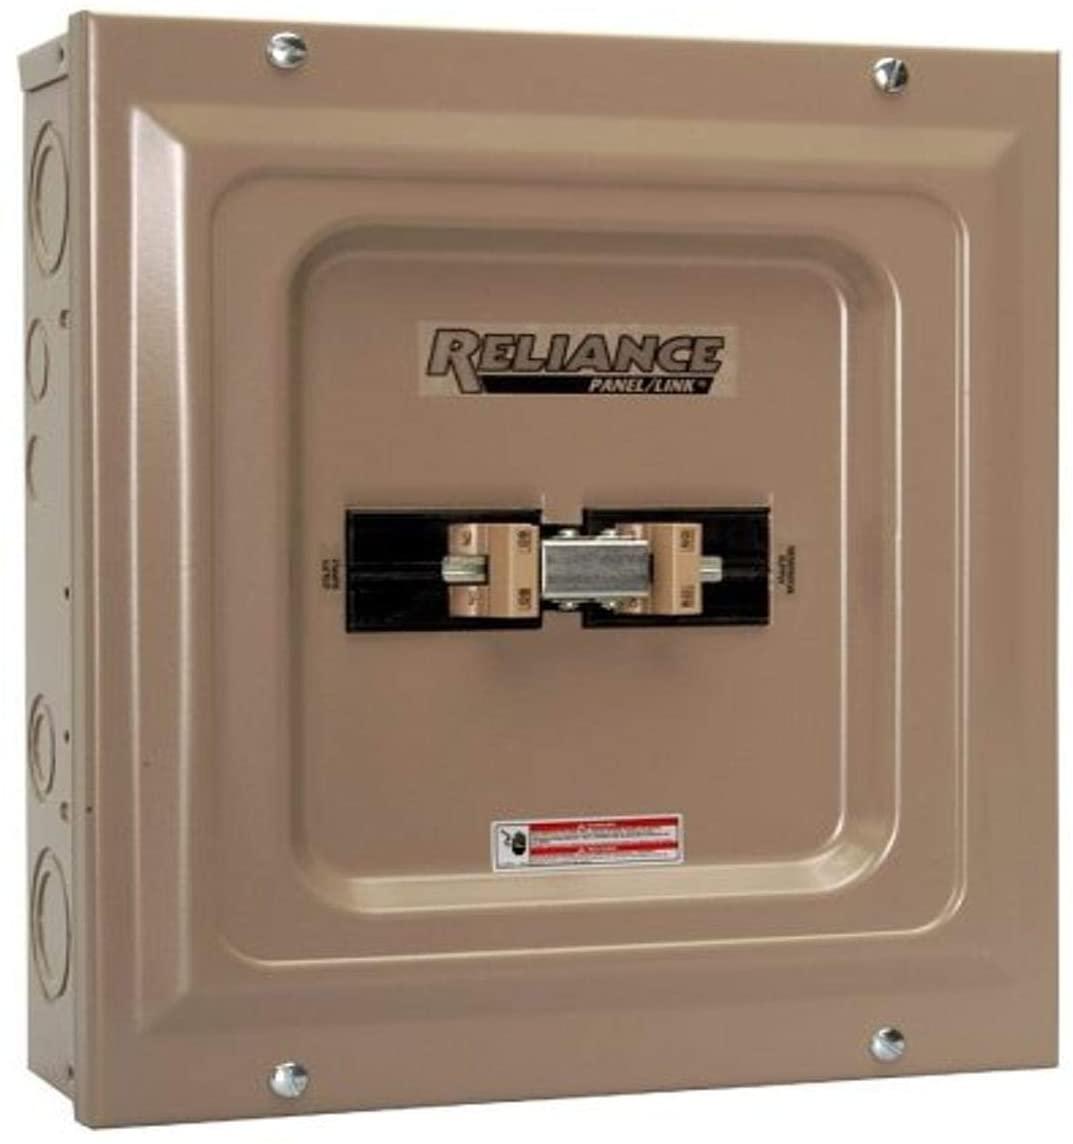 RELIANCE 컨트롤 TCA1006D 패널   링크 전송 패널 회색